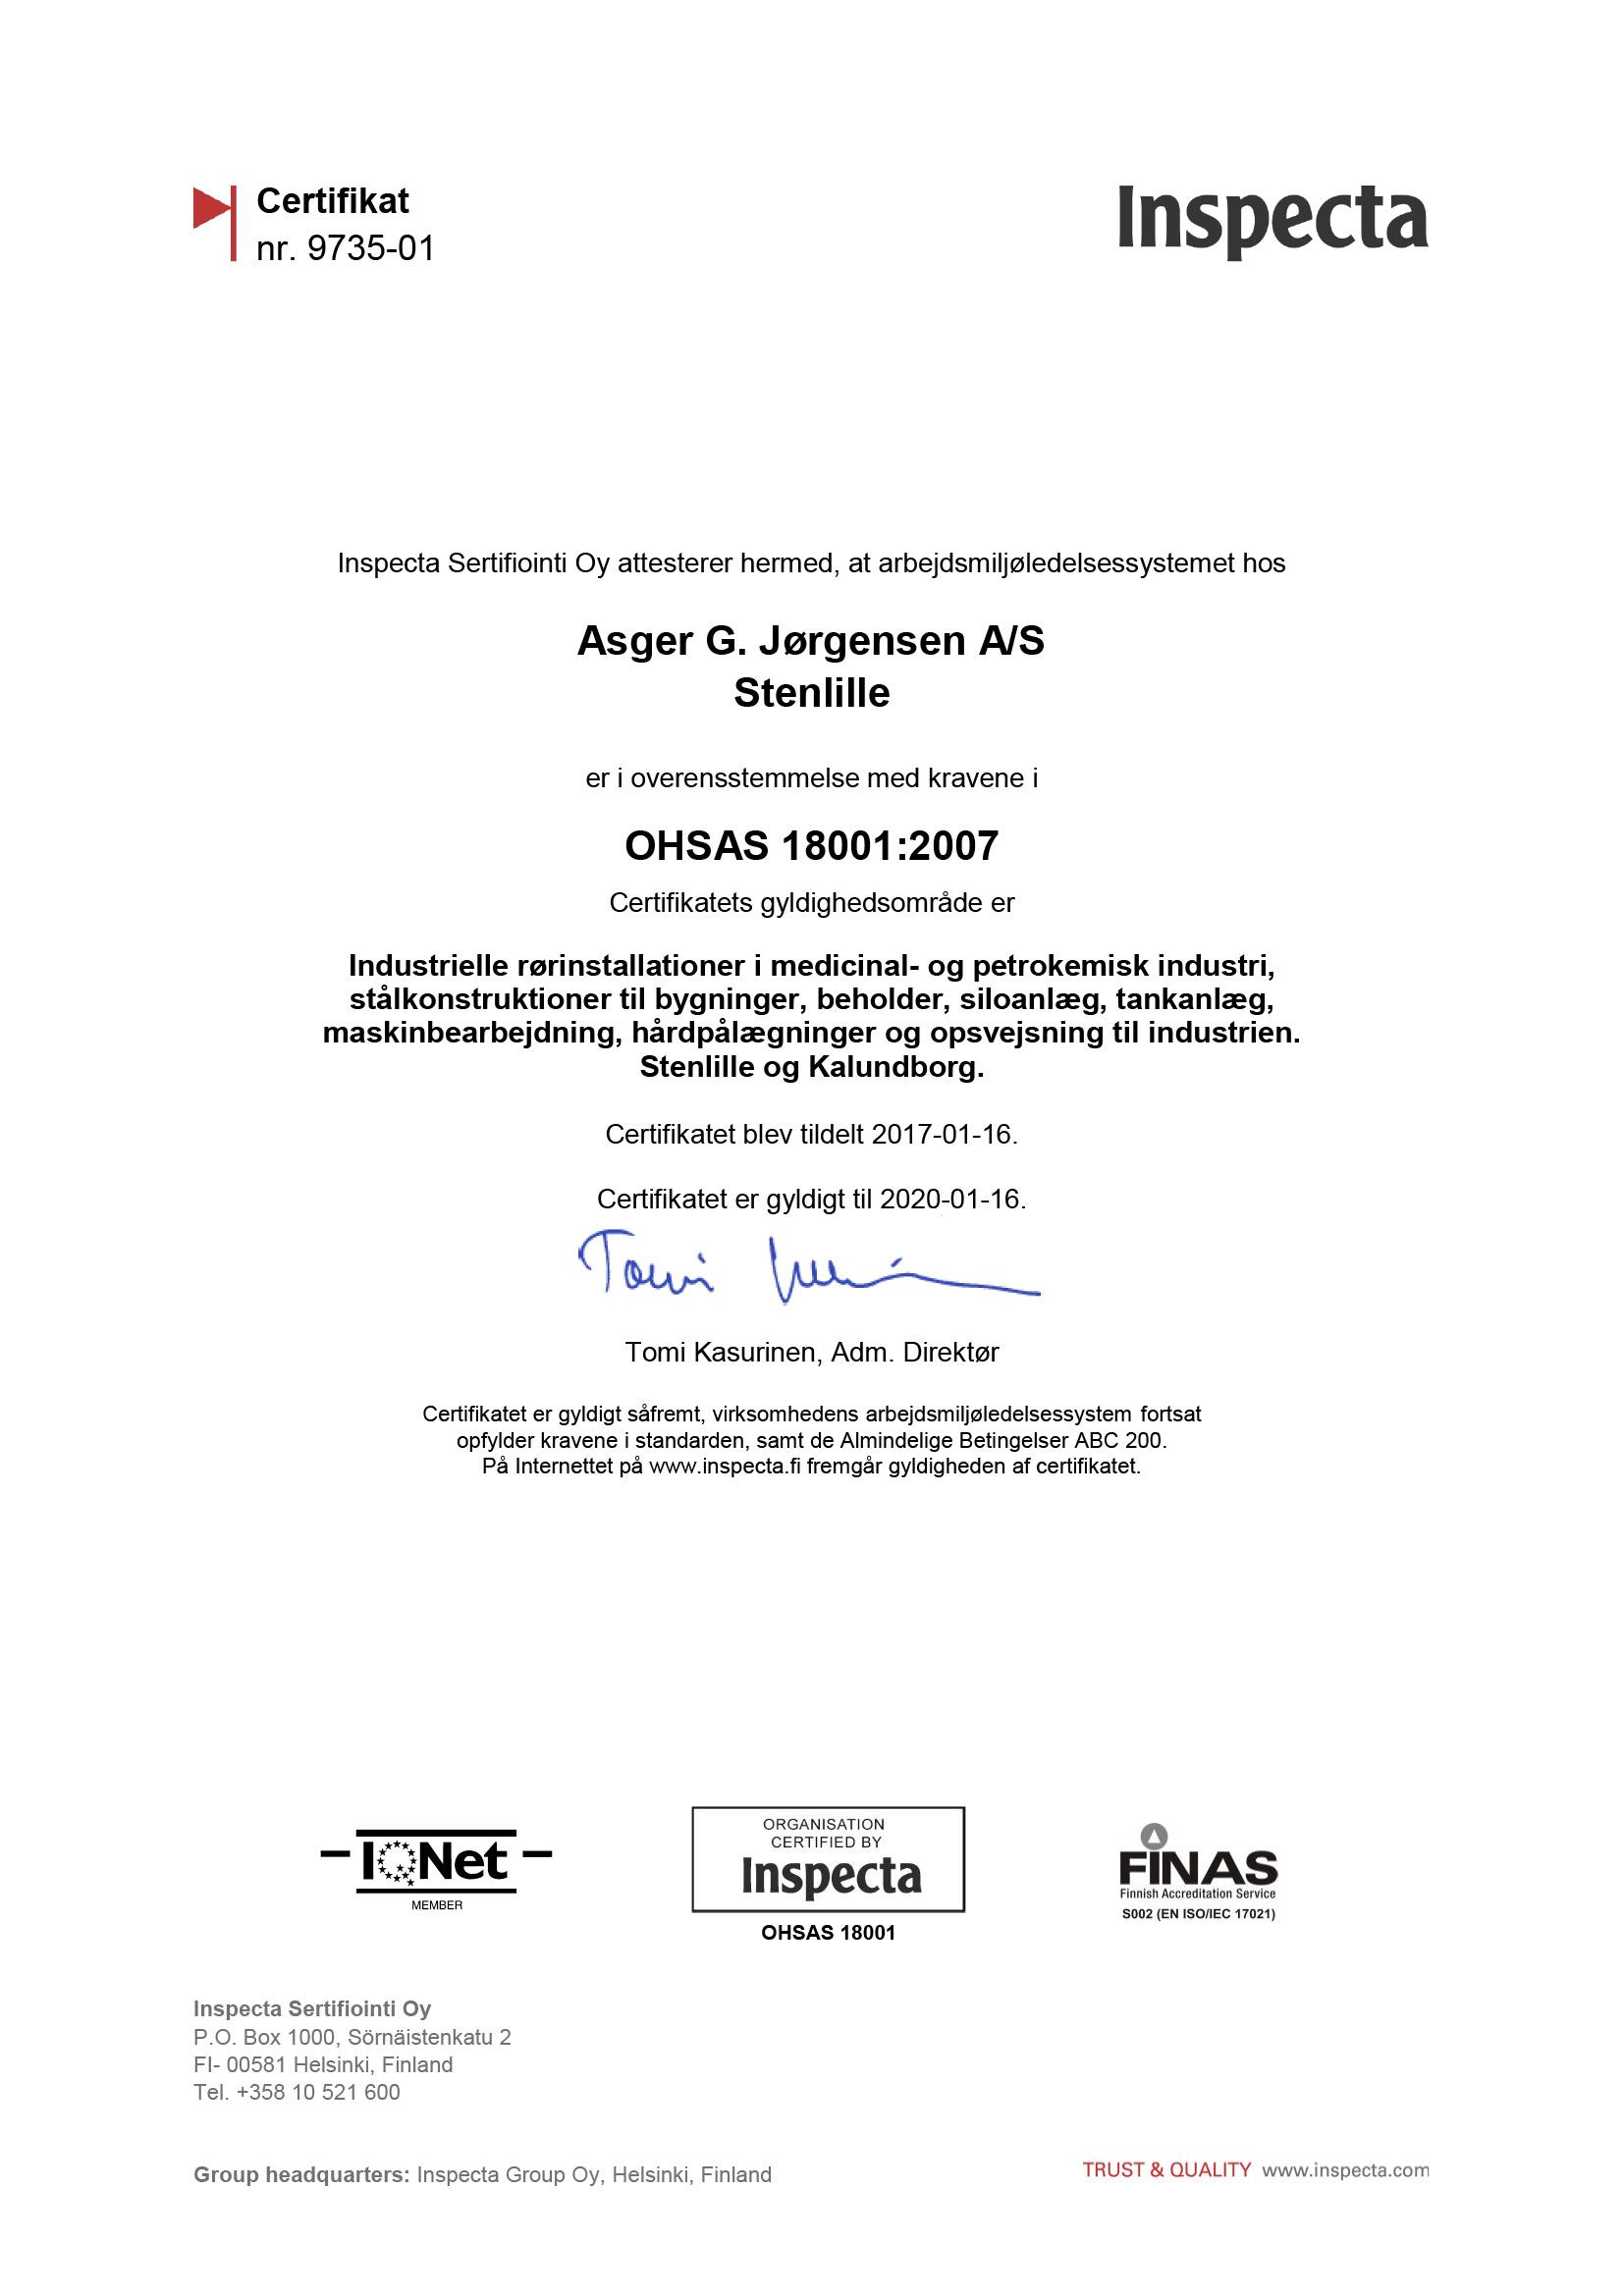 OHSAS 18001 AGJ 2017